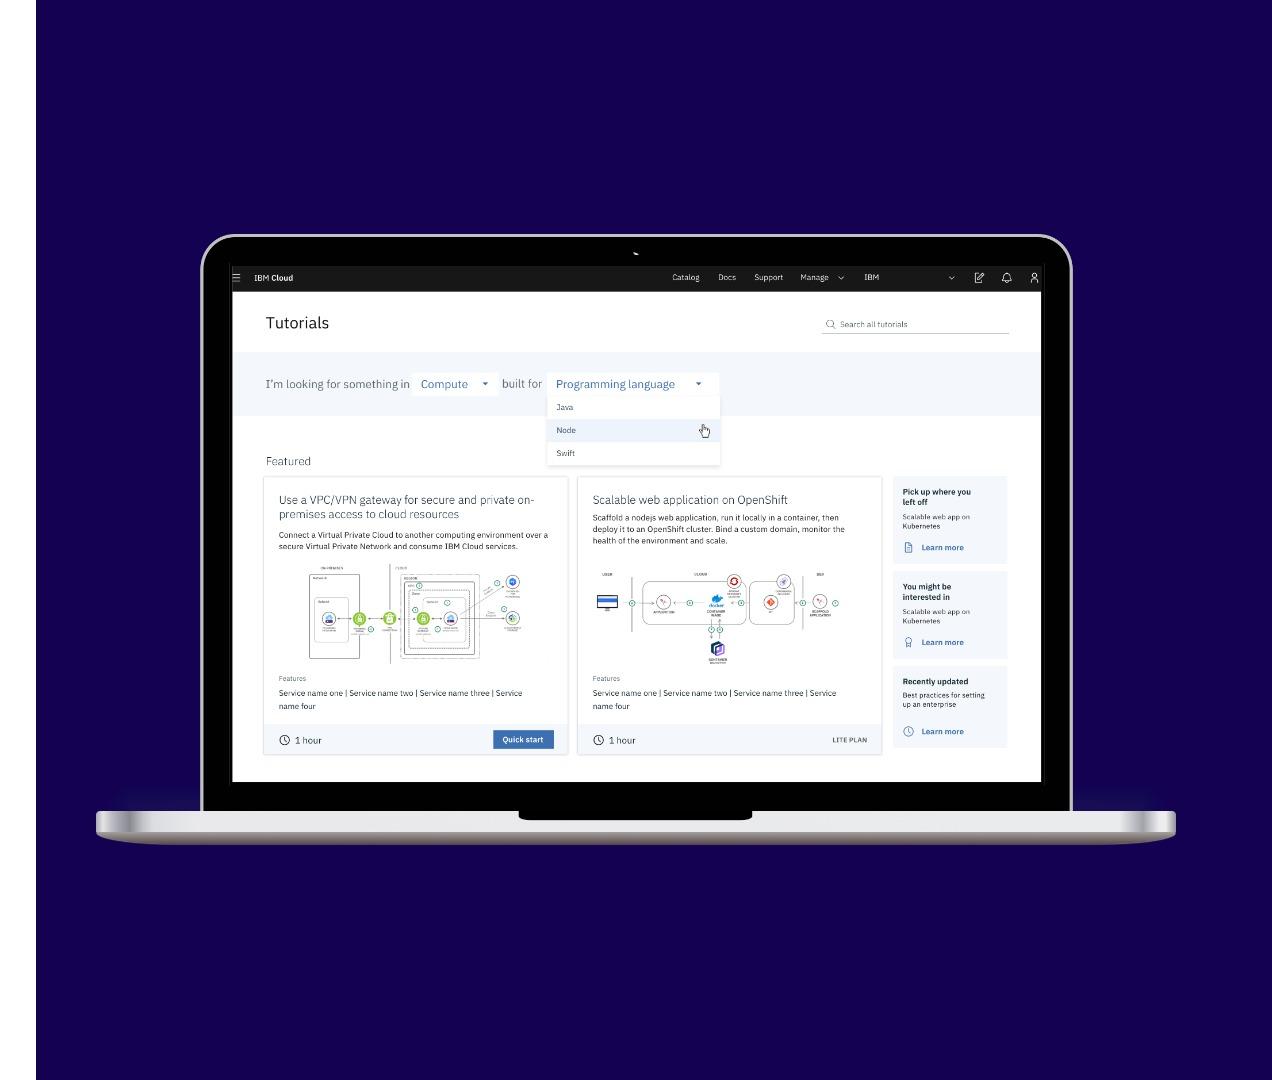 Tutorials for IBM Cloud Documentation